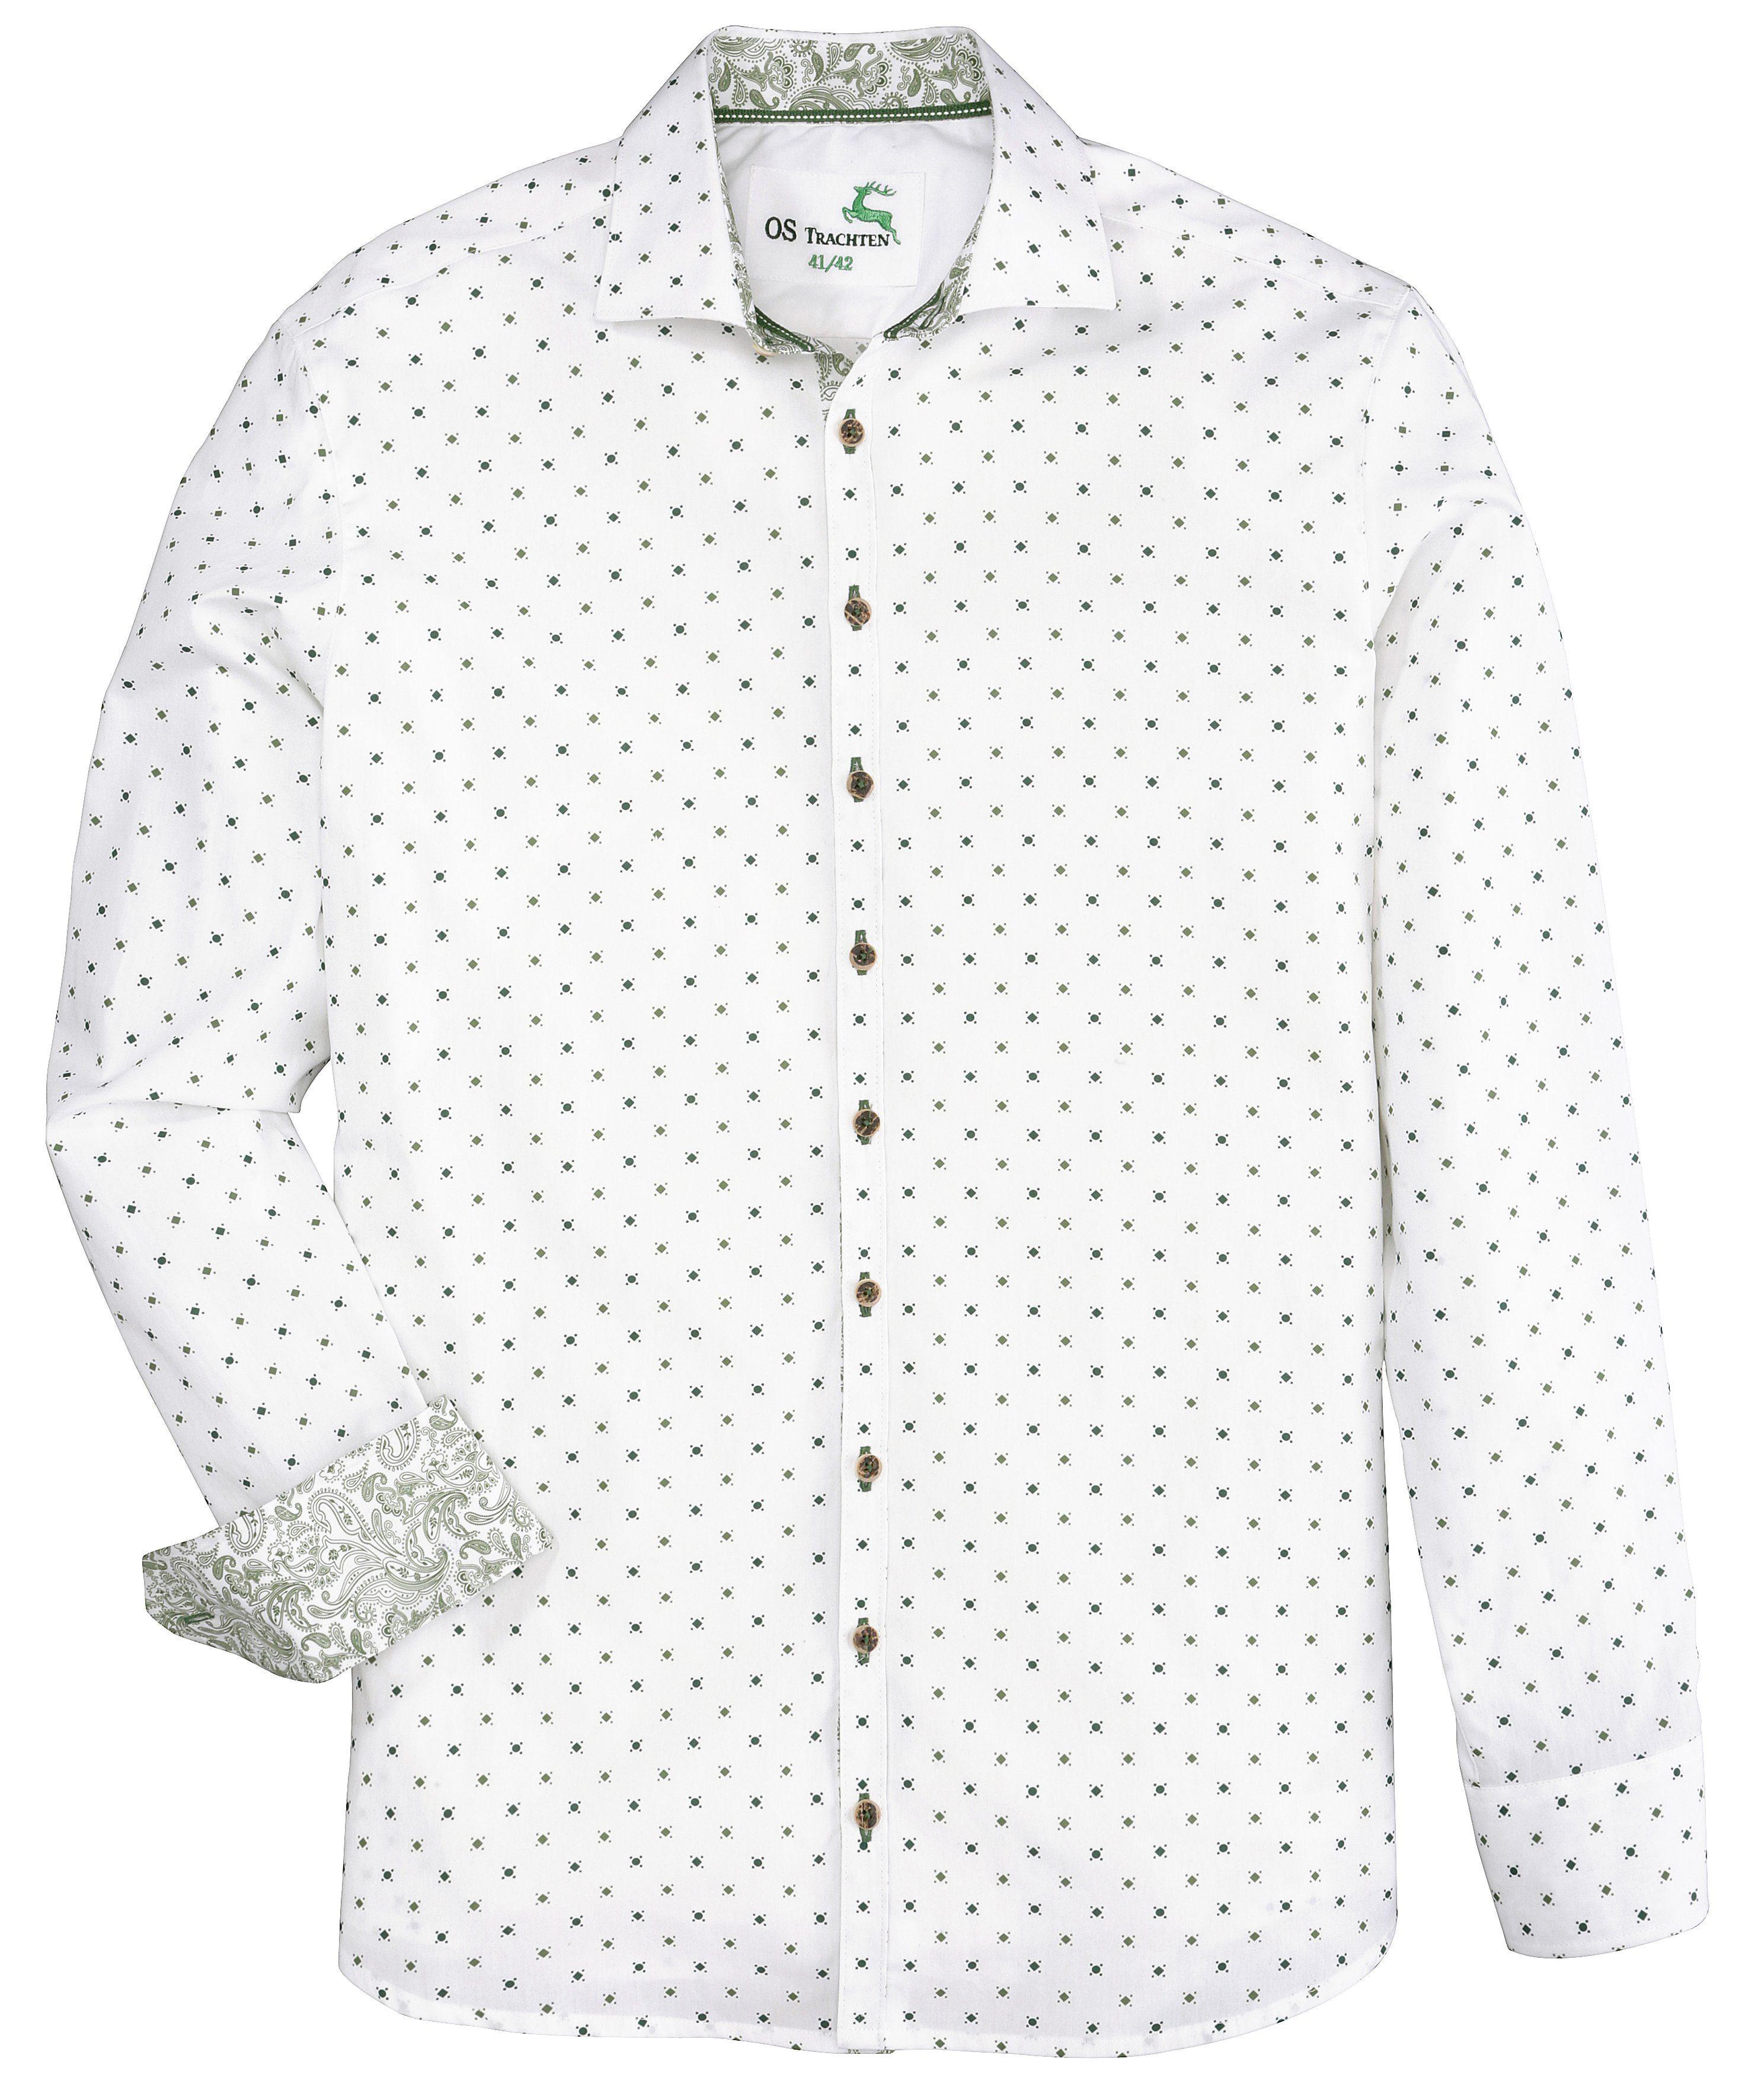 Trachtenhemd im Paisley-Design